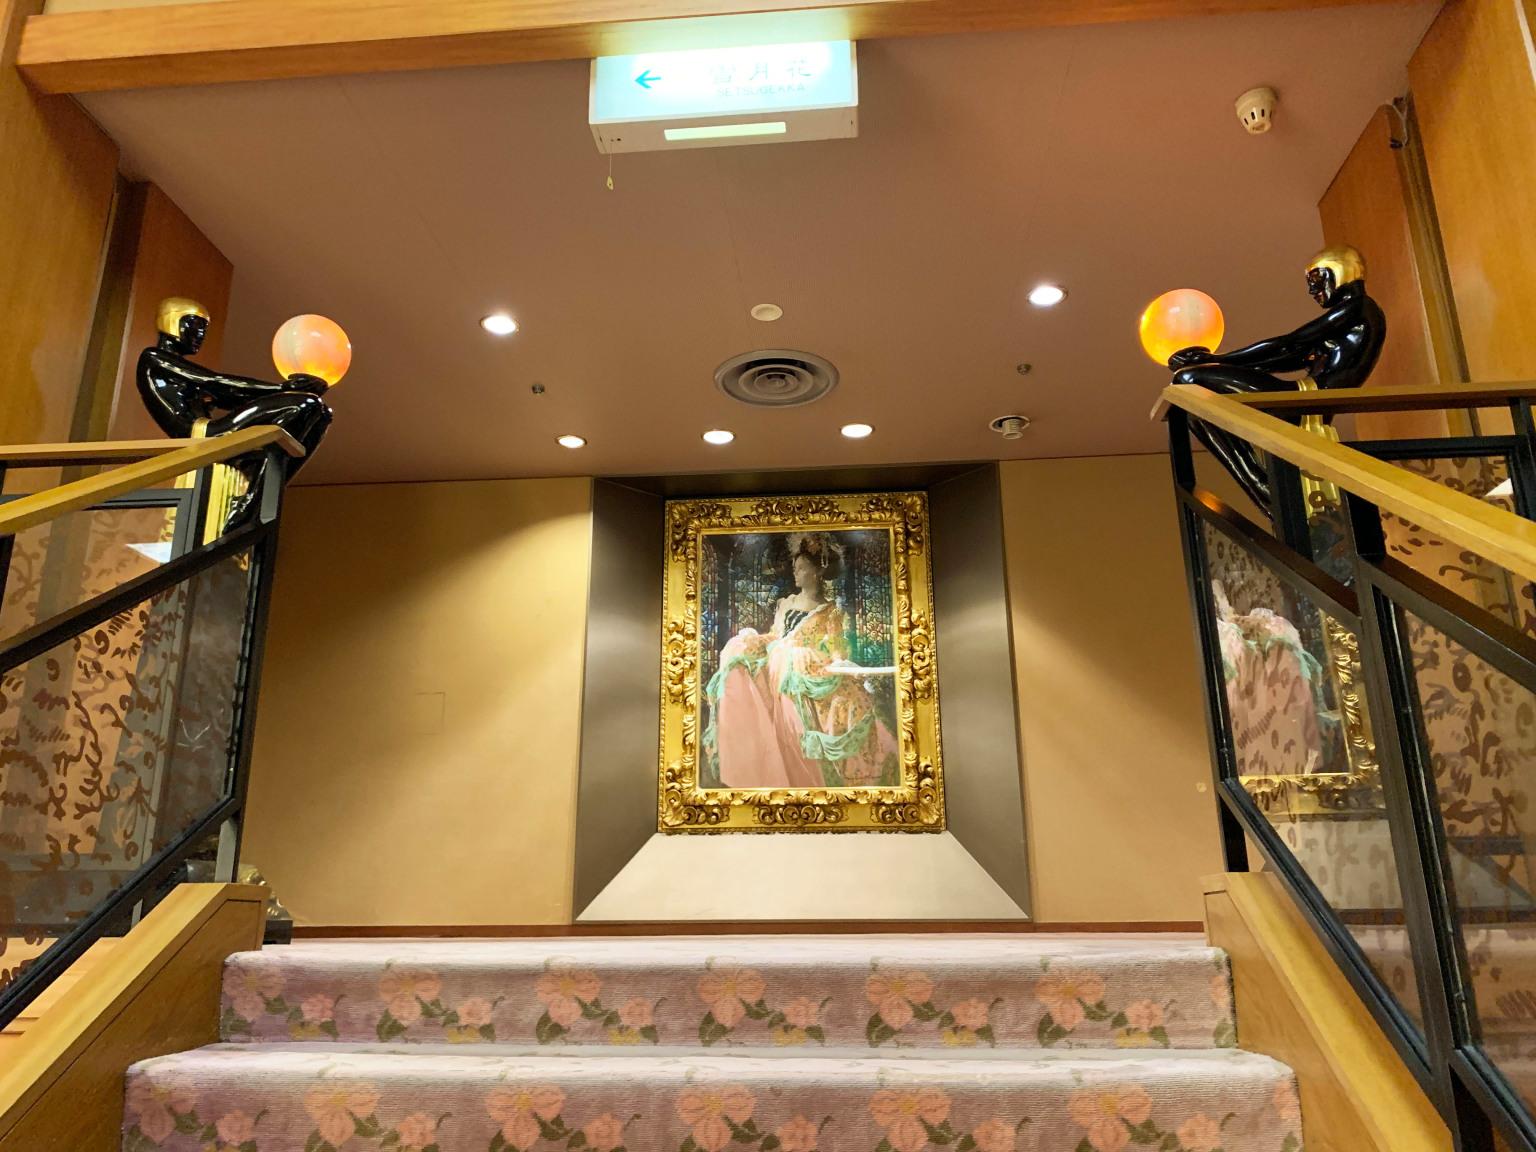 Houshi-Ryokan-onsen-hotel-oldest-in-world-Japan-business-travel-Hoshi-accommodation-stay-photos-reviews-Ishikawa-26.jpg